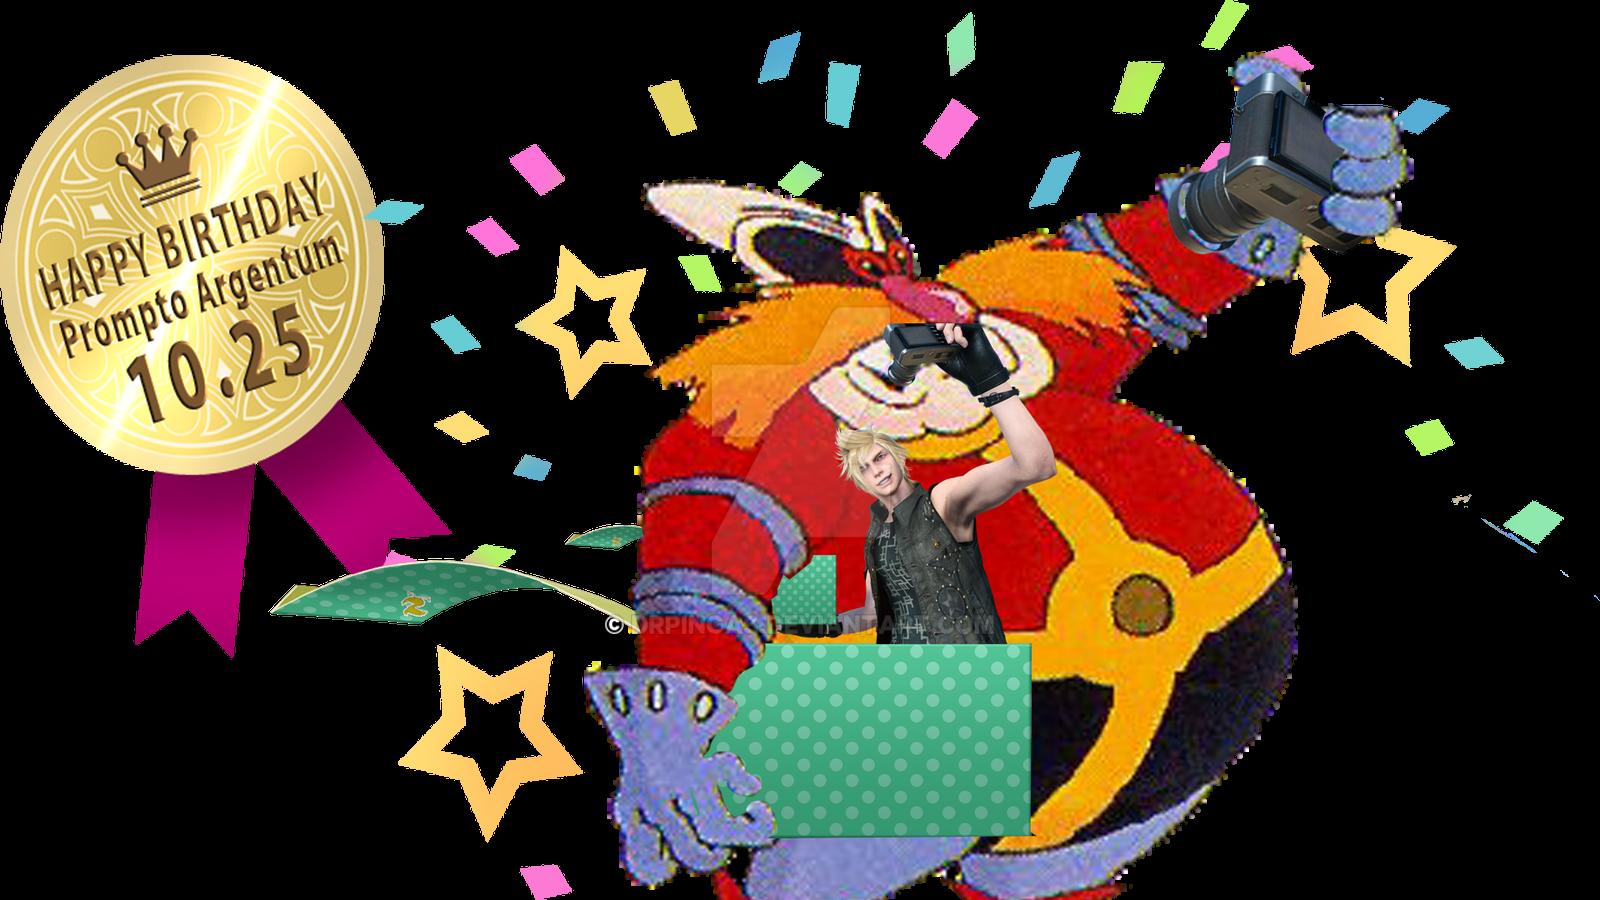 Robotnick FFXV prompto birthday gift star by DrPingas